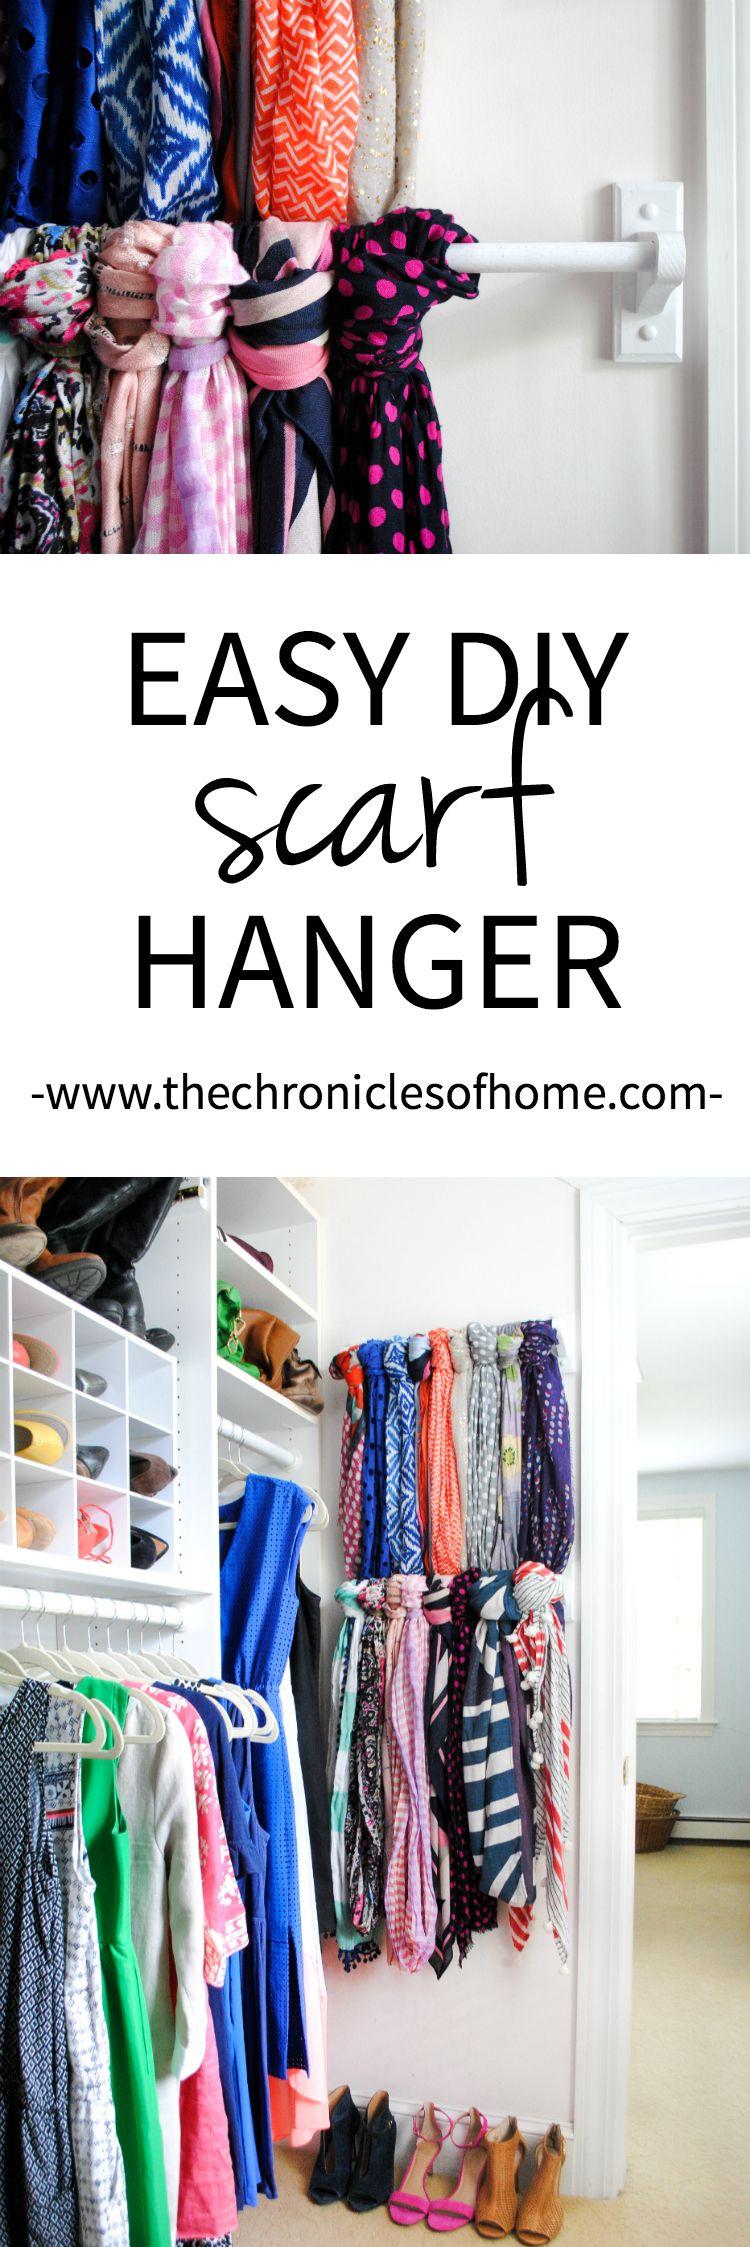 Scarf Hanger {closetanization Ideas